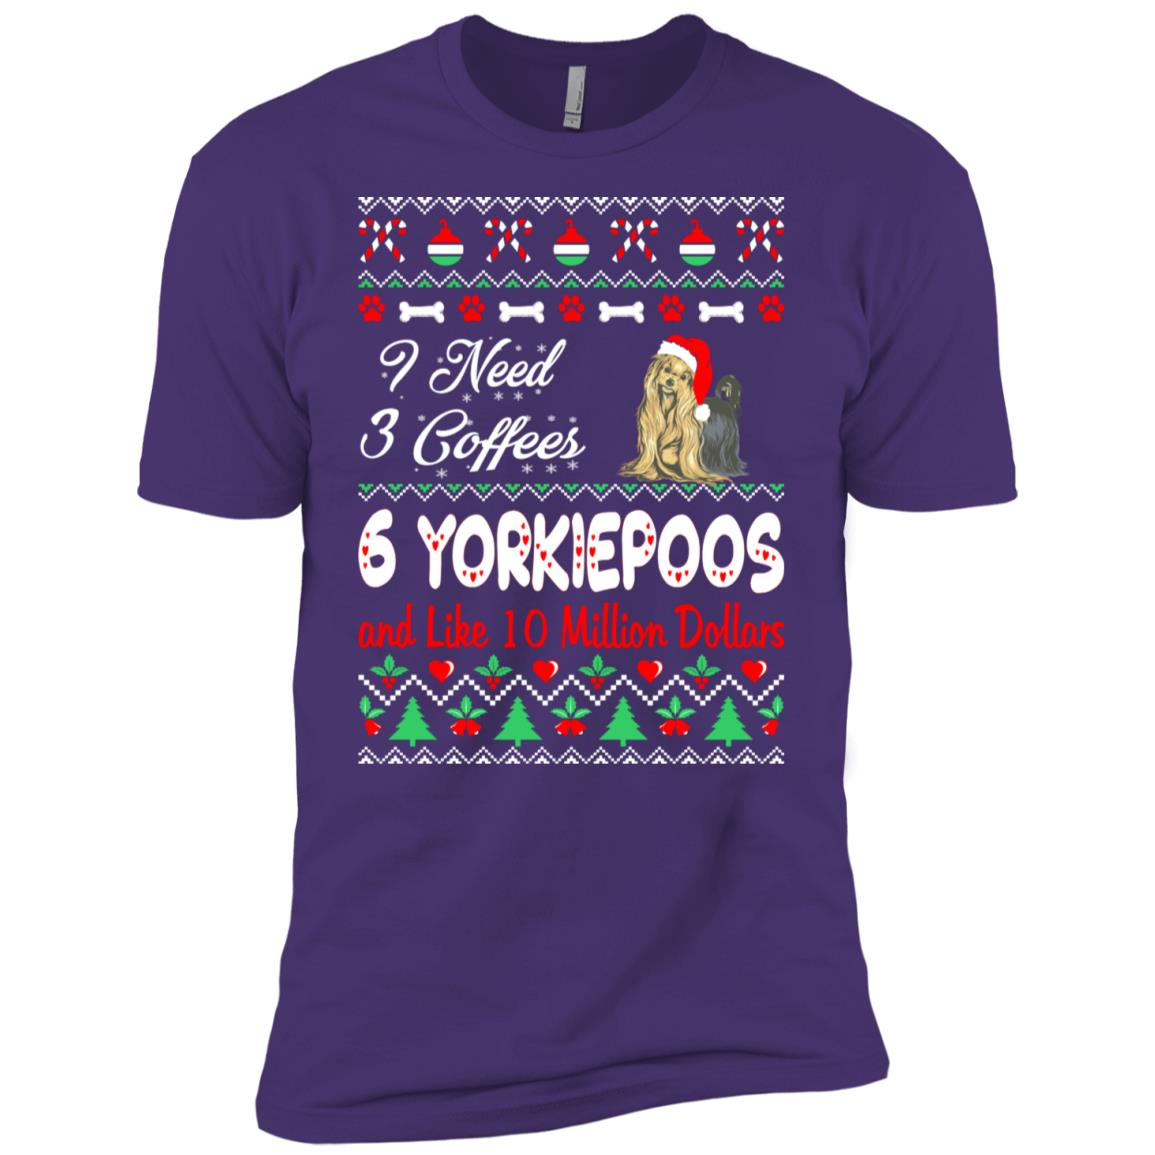 Need 3 Coffees 6 Yorkiepoos Christmas Ugly Sweater Men Short Sleeve T-Shirt